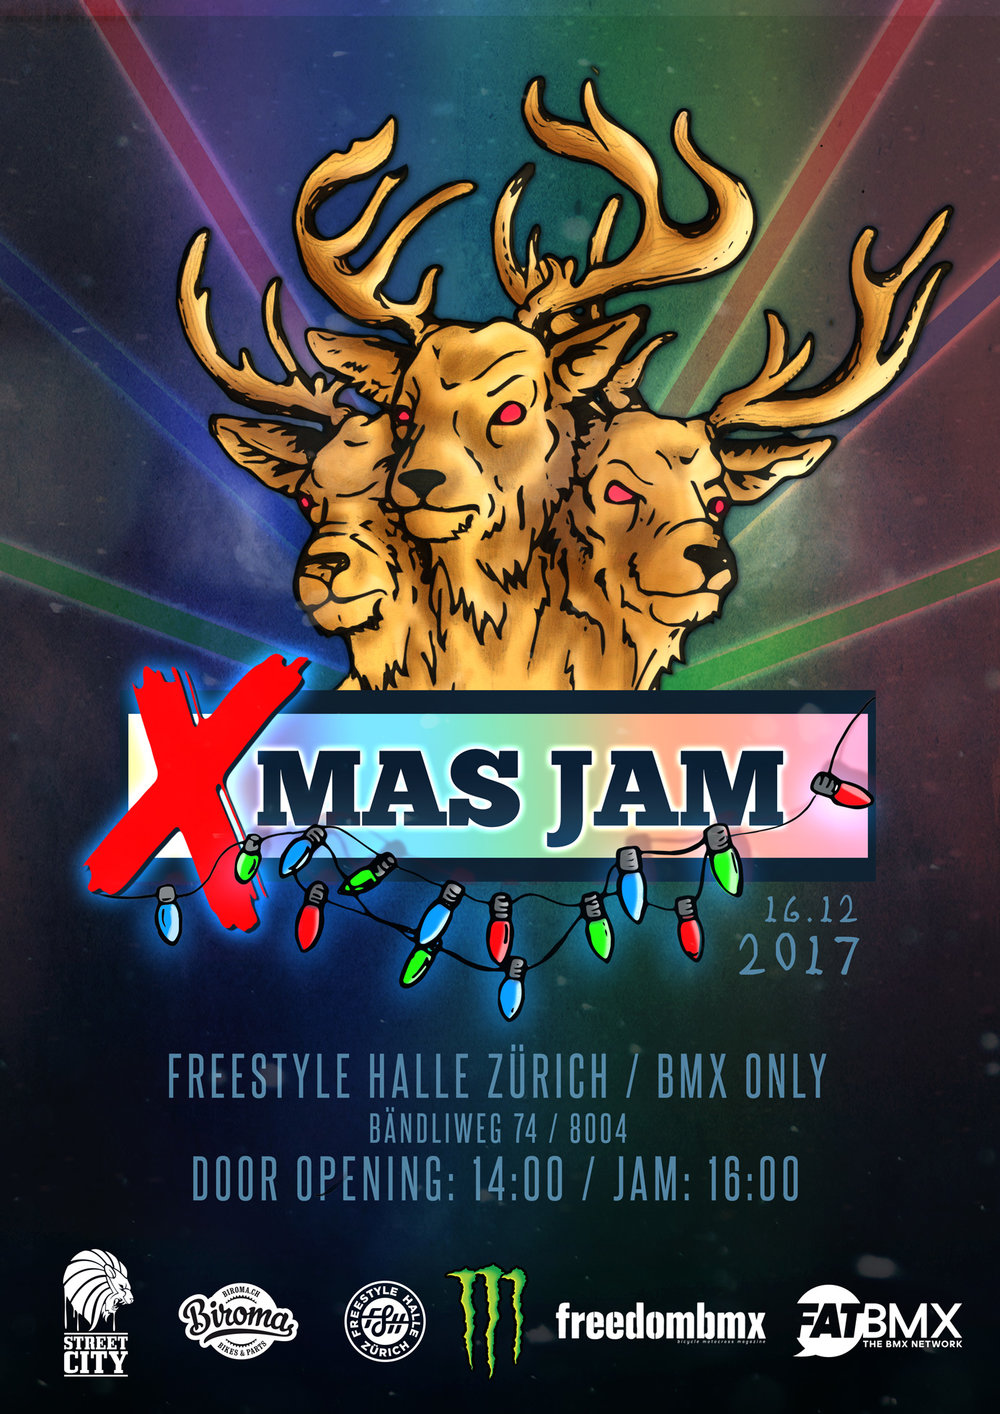 xmas-jam_2017-flyer.JPG